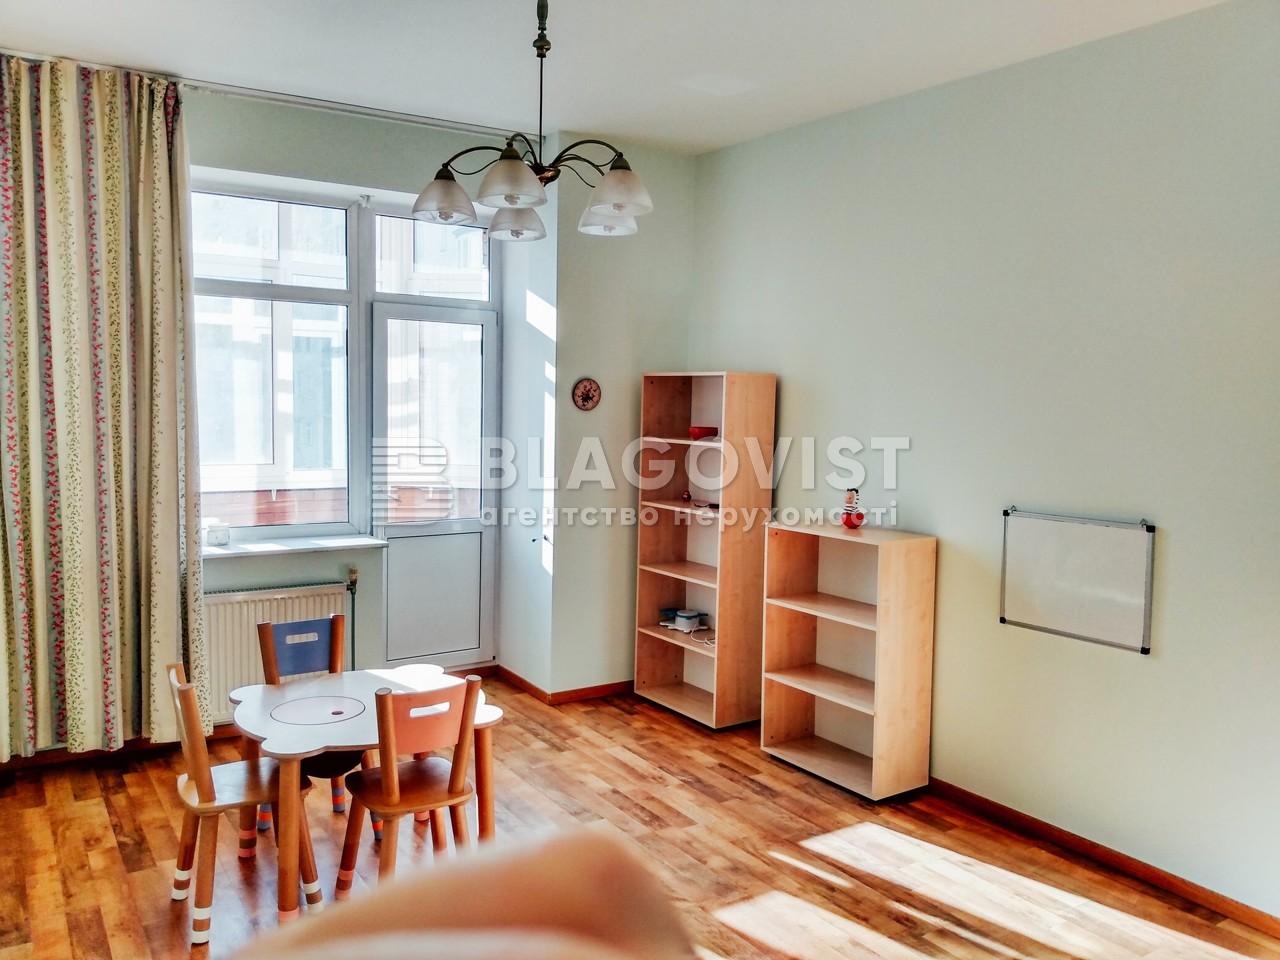 Квартира R-16873, Павловская, 17, Киев - Фото 31